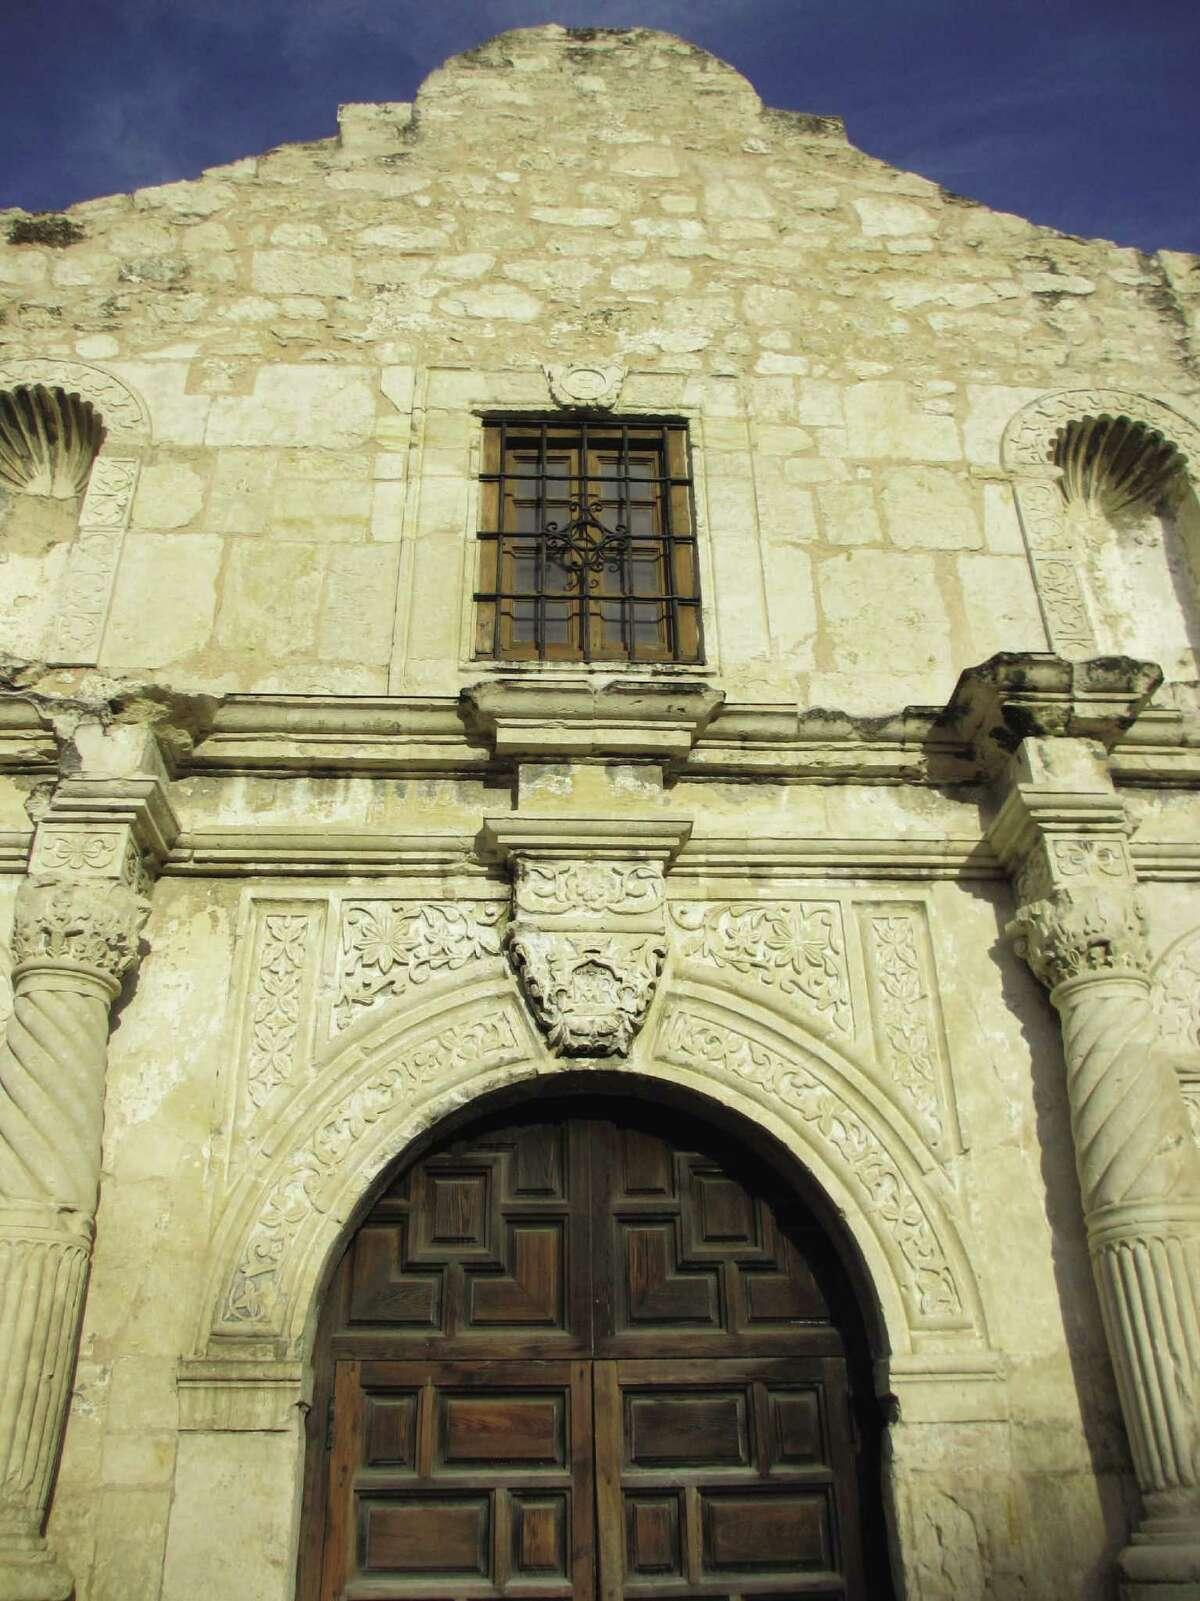 The Alamo church is not